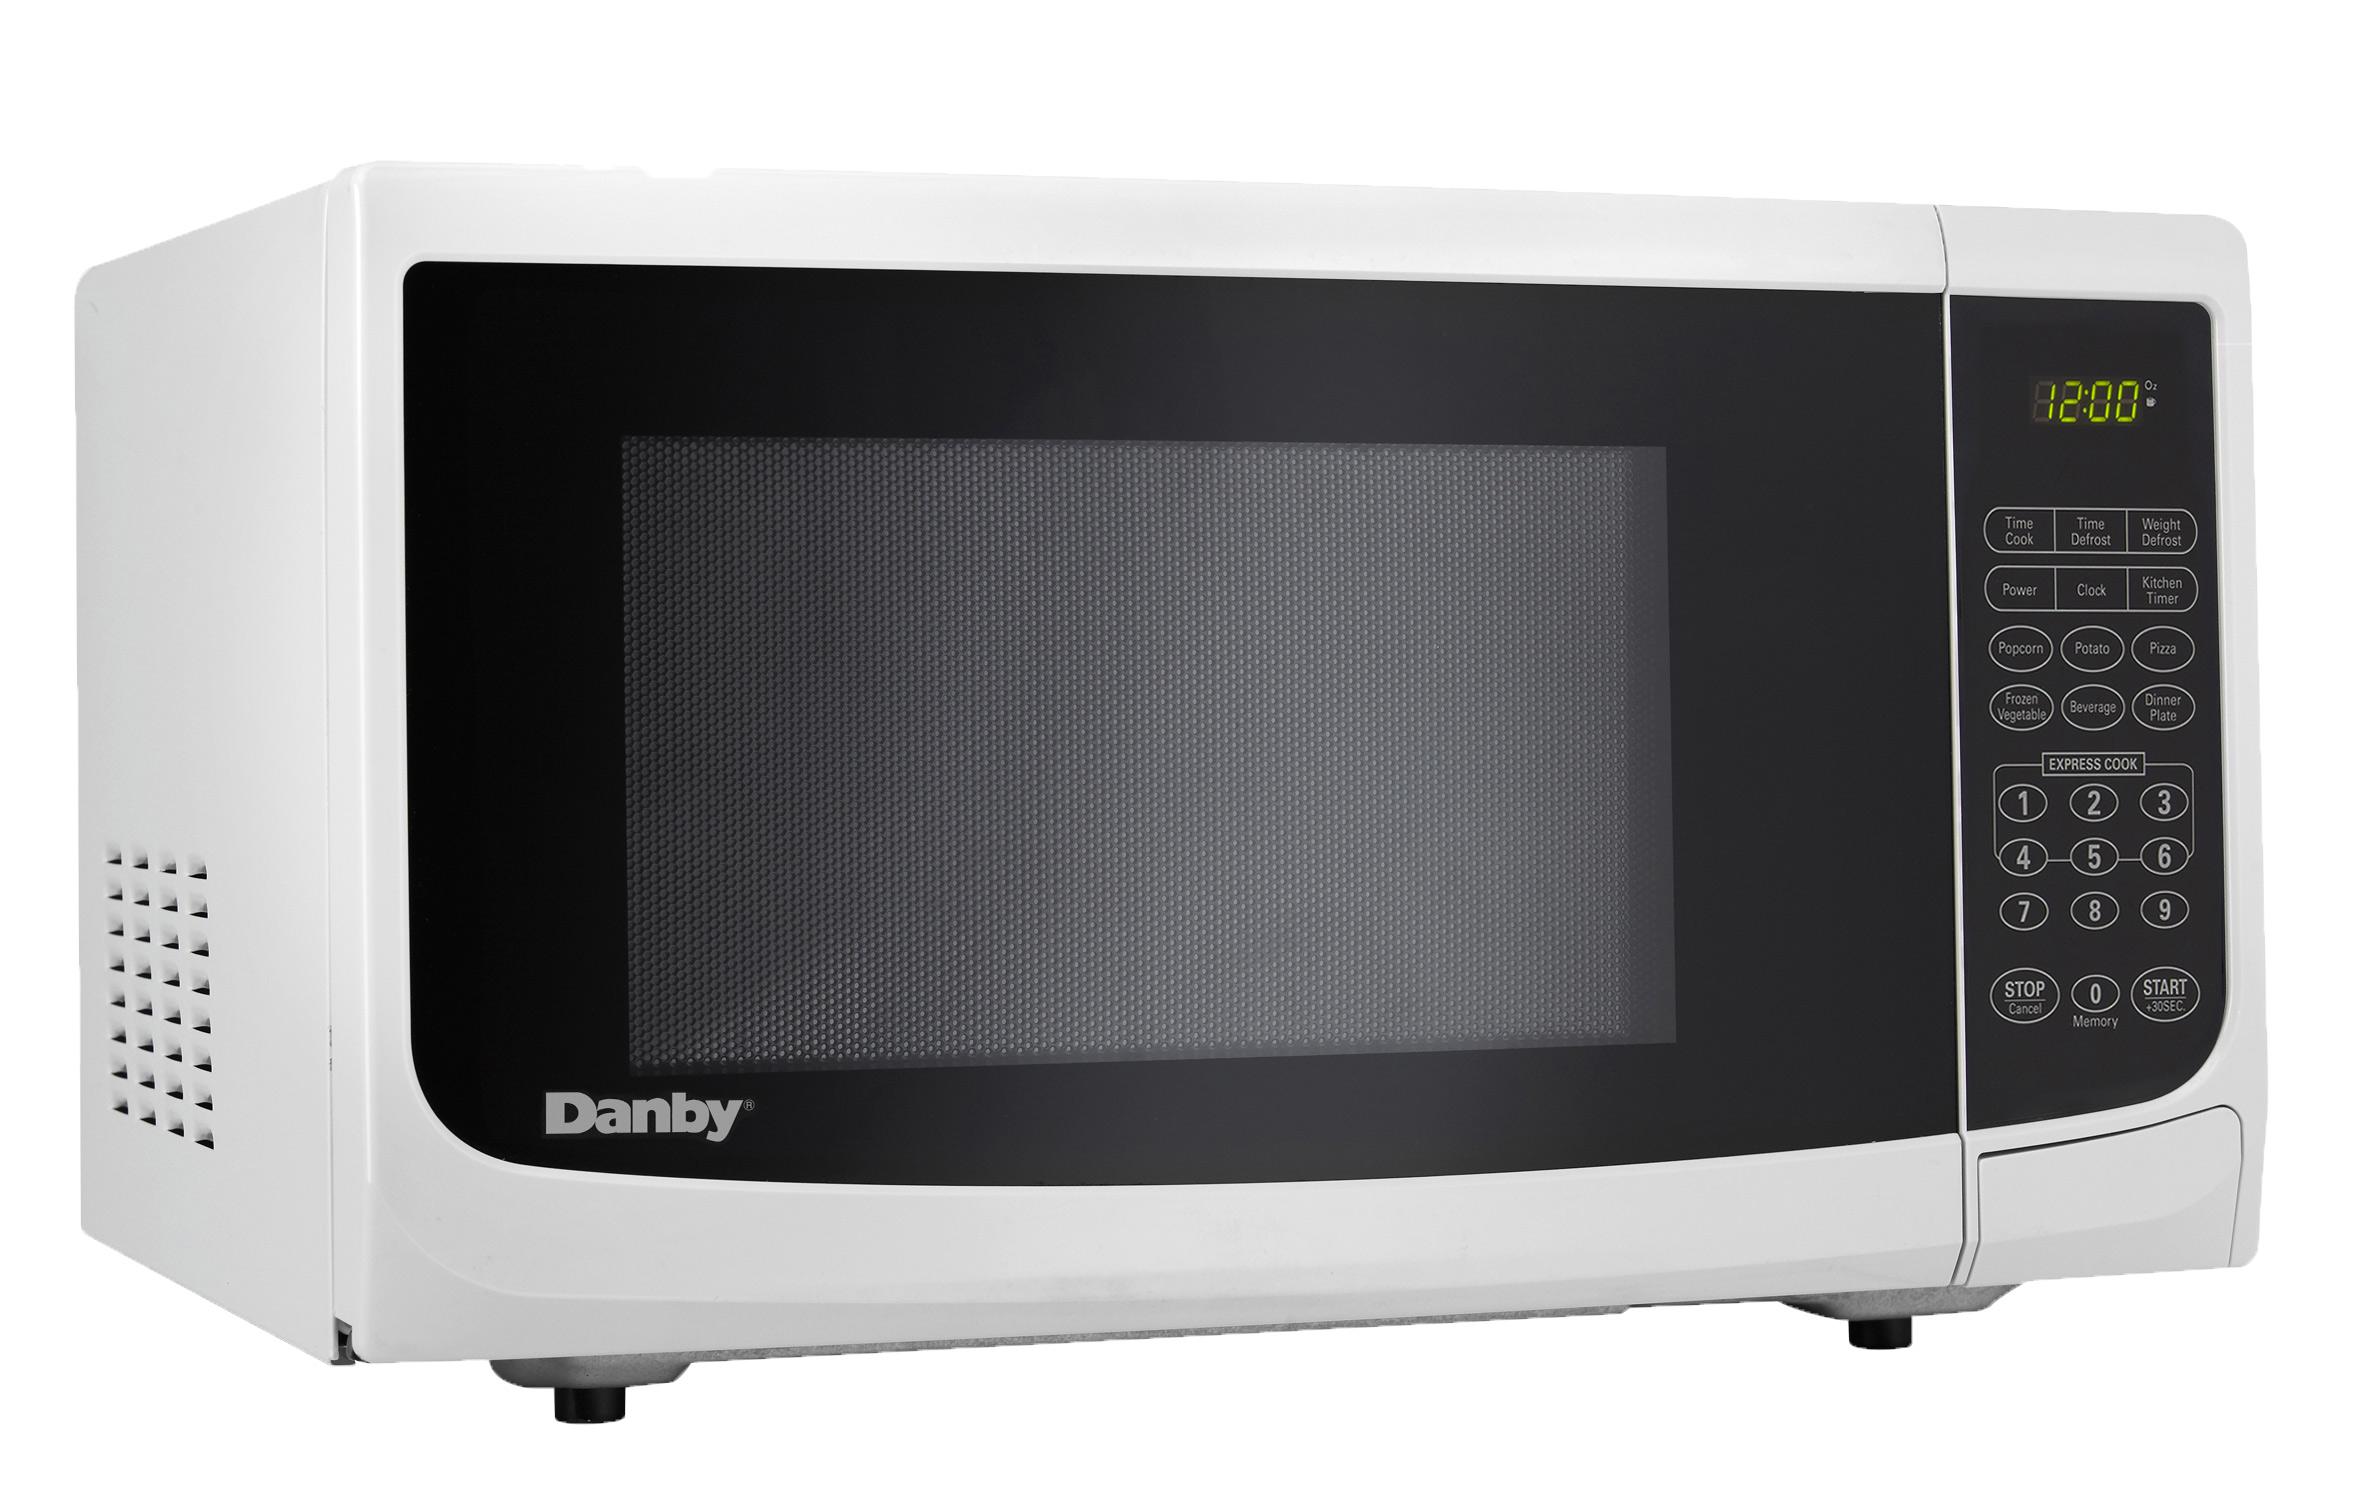 1.1 cu. ft. Danby® Microwave